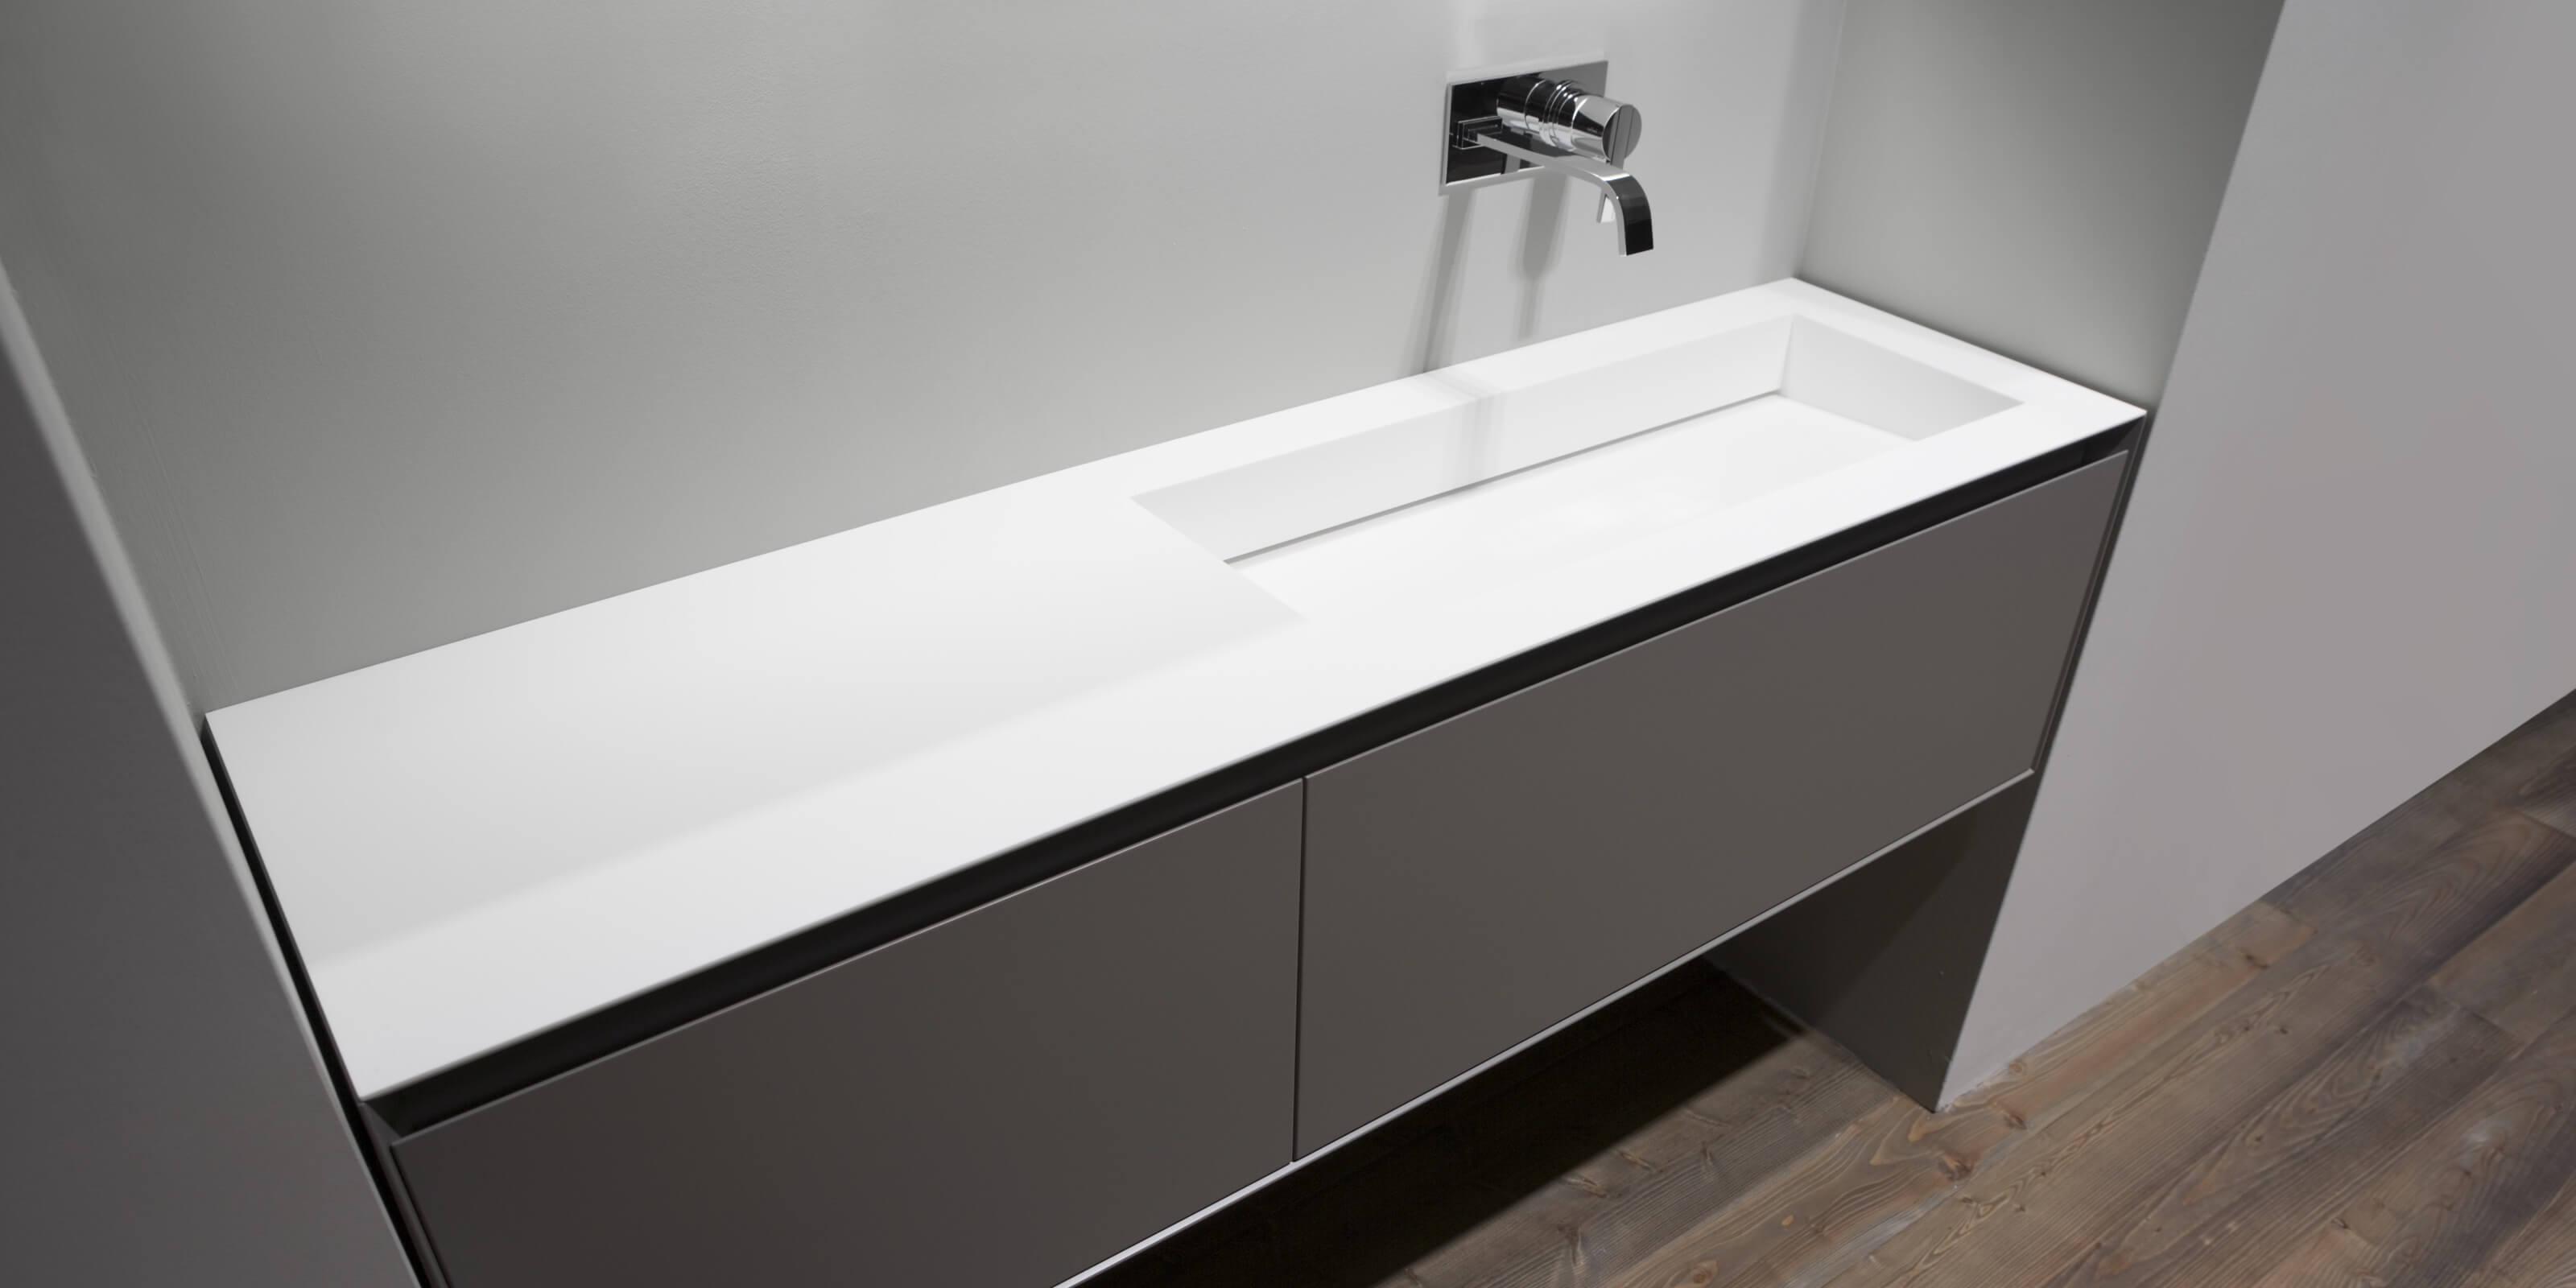 Piano Lavabo In Corian teknoserstone | corian banyo| gizli giderli lavabo|akrilik